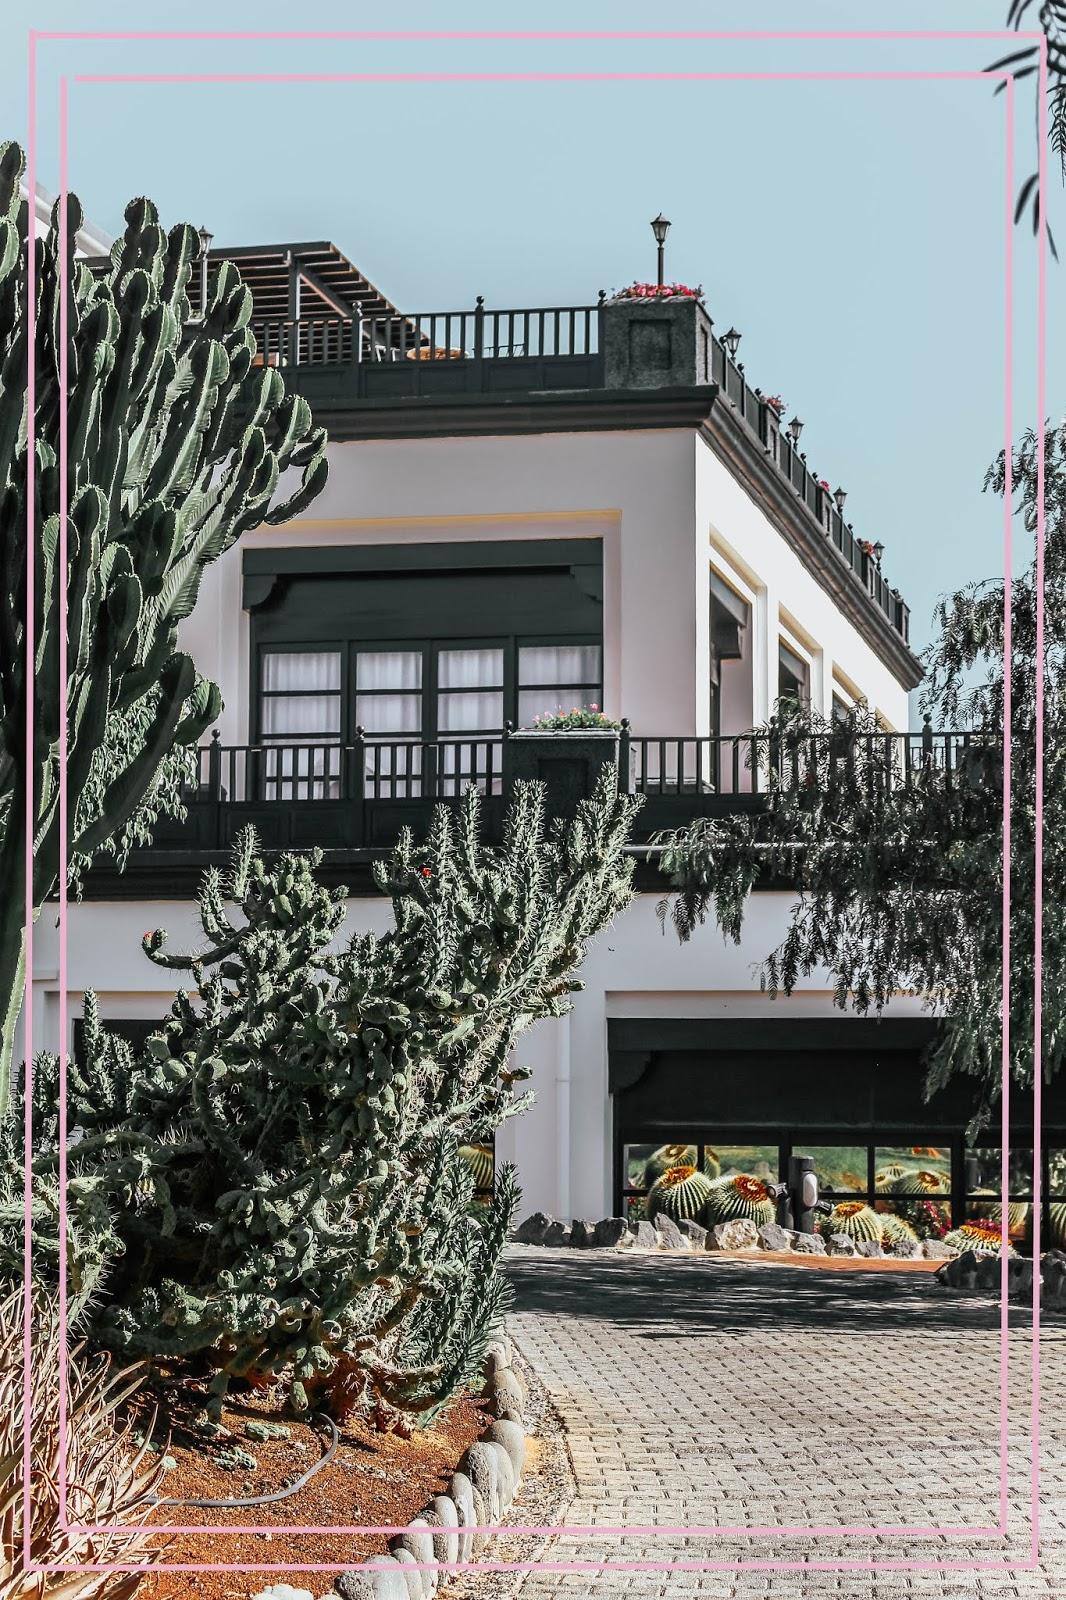 H10 Rubicon Palace Hotel Architecture Design